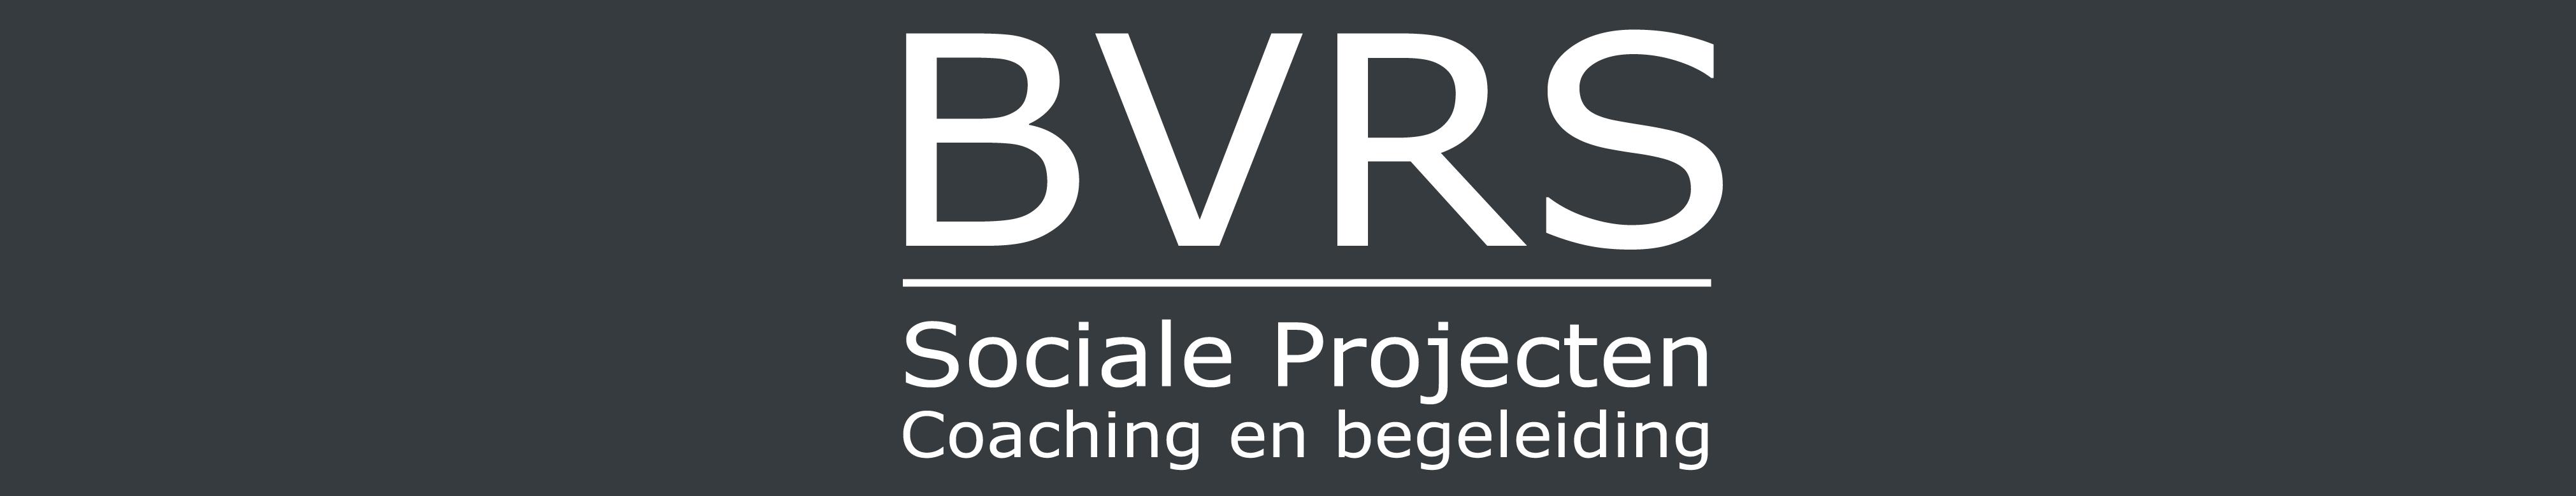 BVRS BANNER GREY